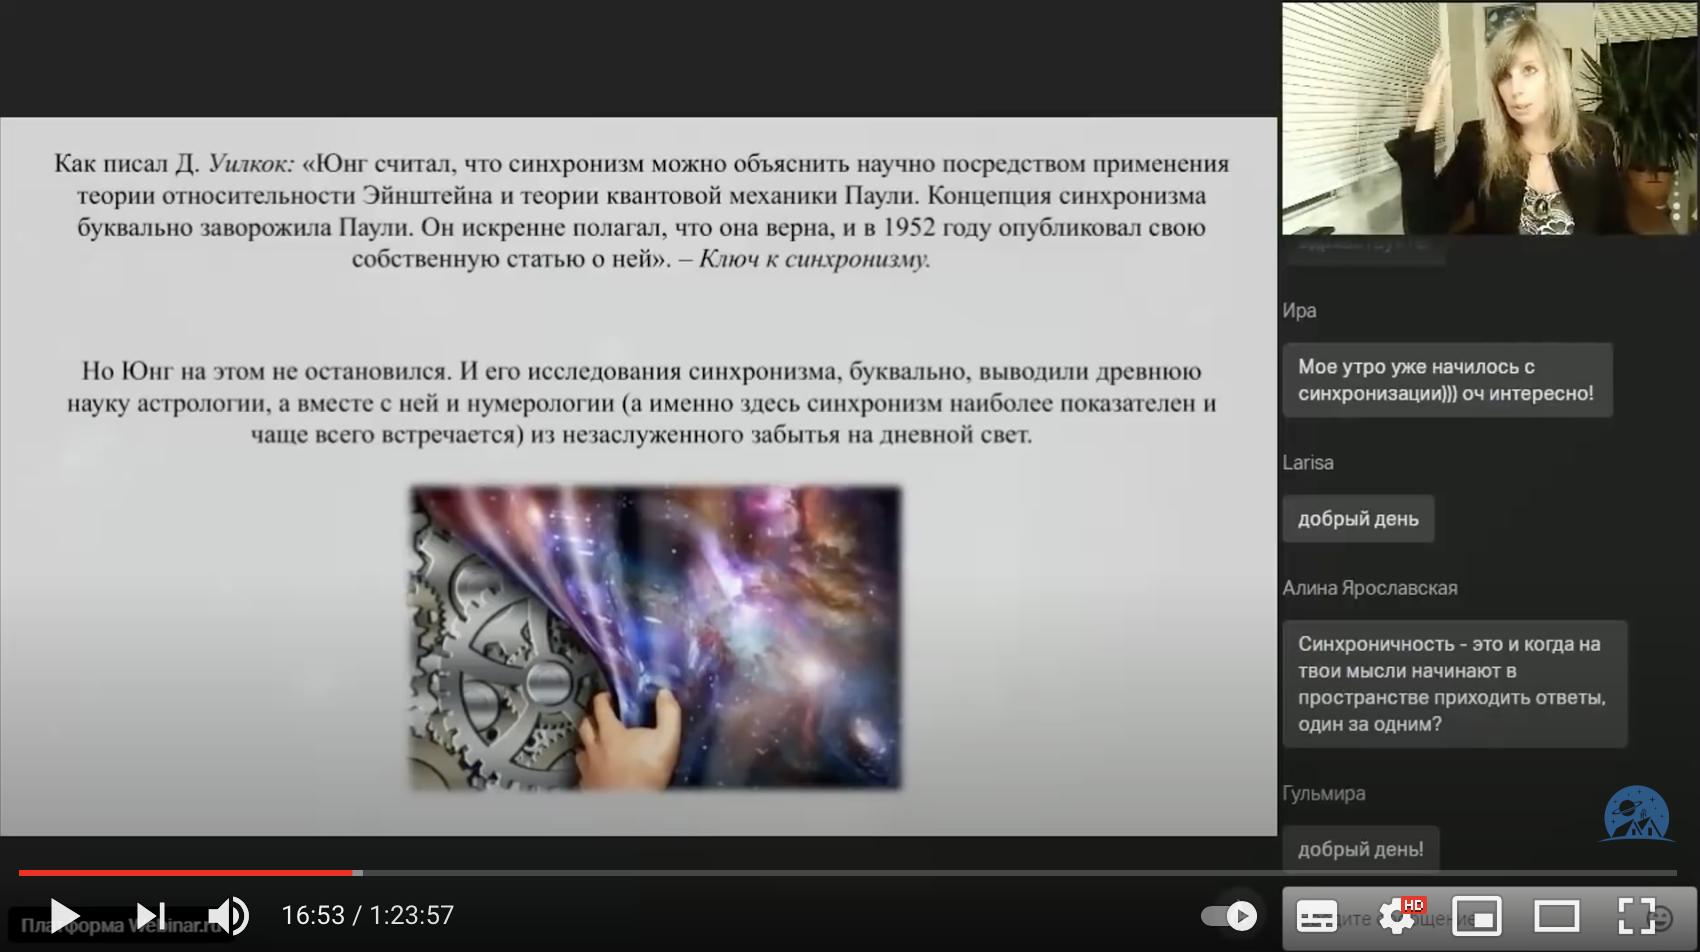 https://astrologtasha.ru/wp-content/uploads/2021/04/Screen-Shot-2021-04-13-at-11.42.22-PM.png